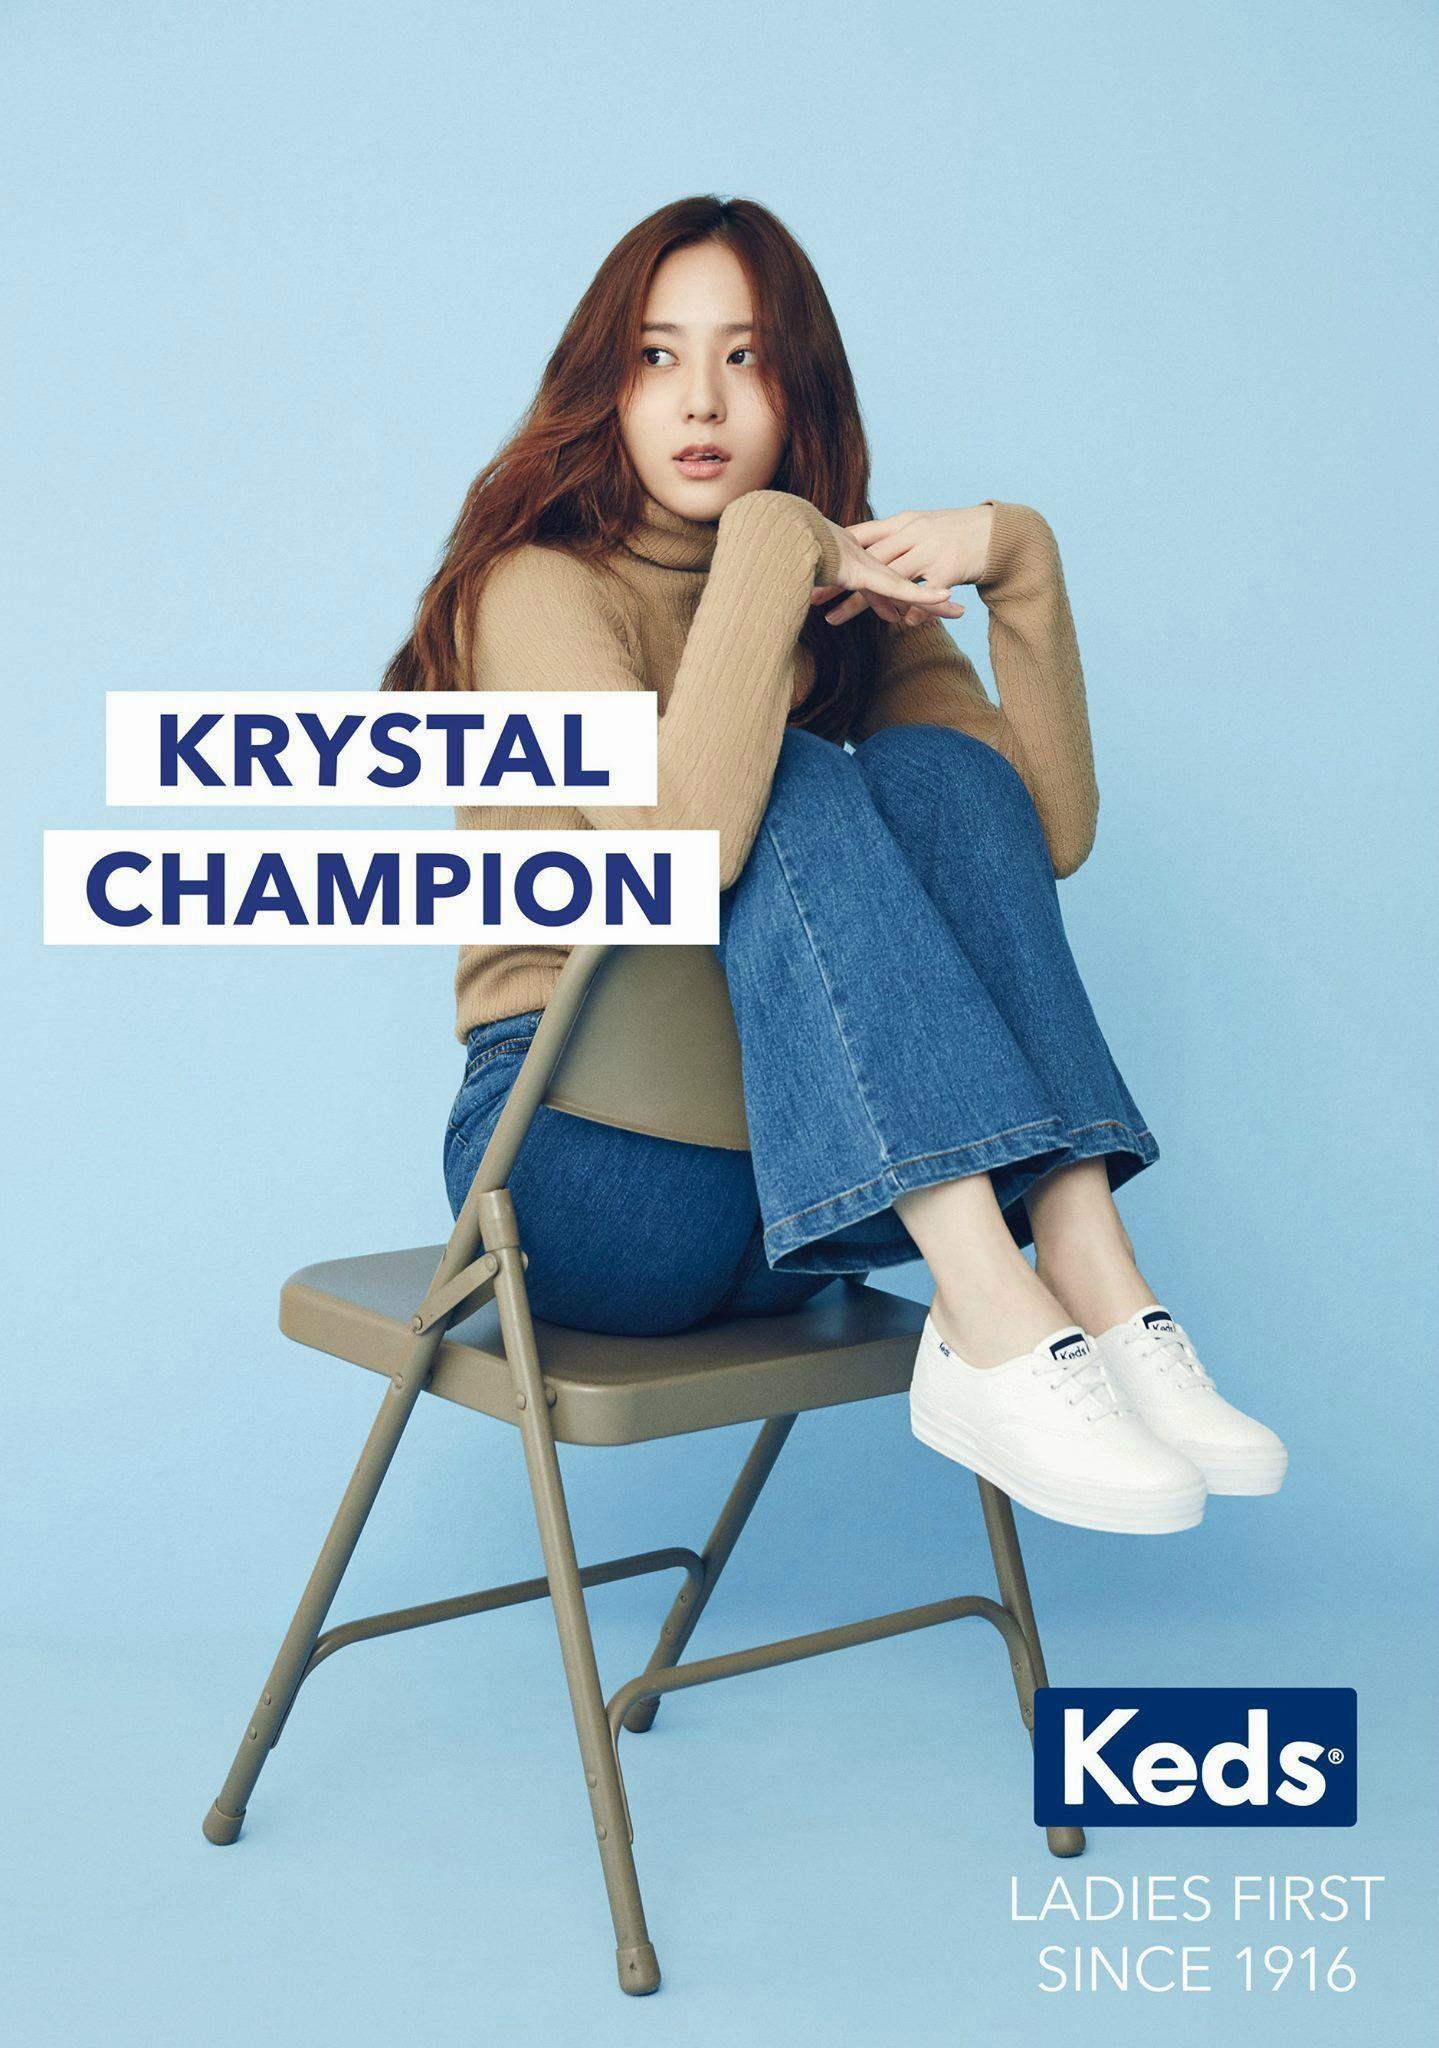 Krystal naked fake doesn't matter!